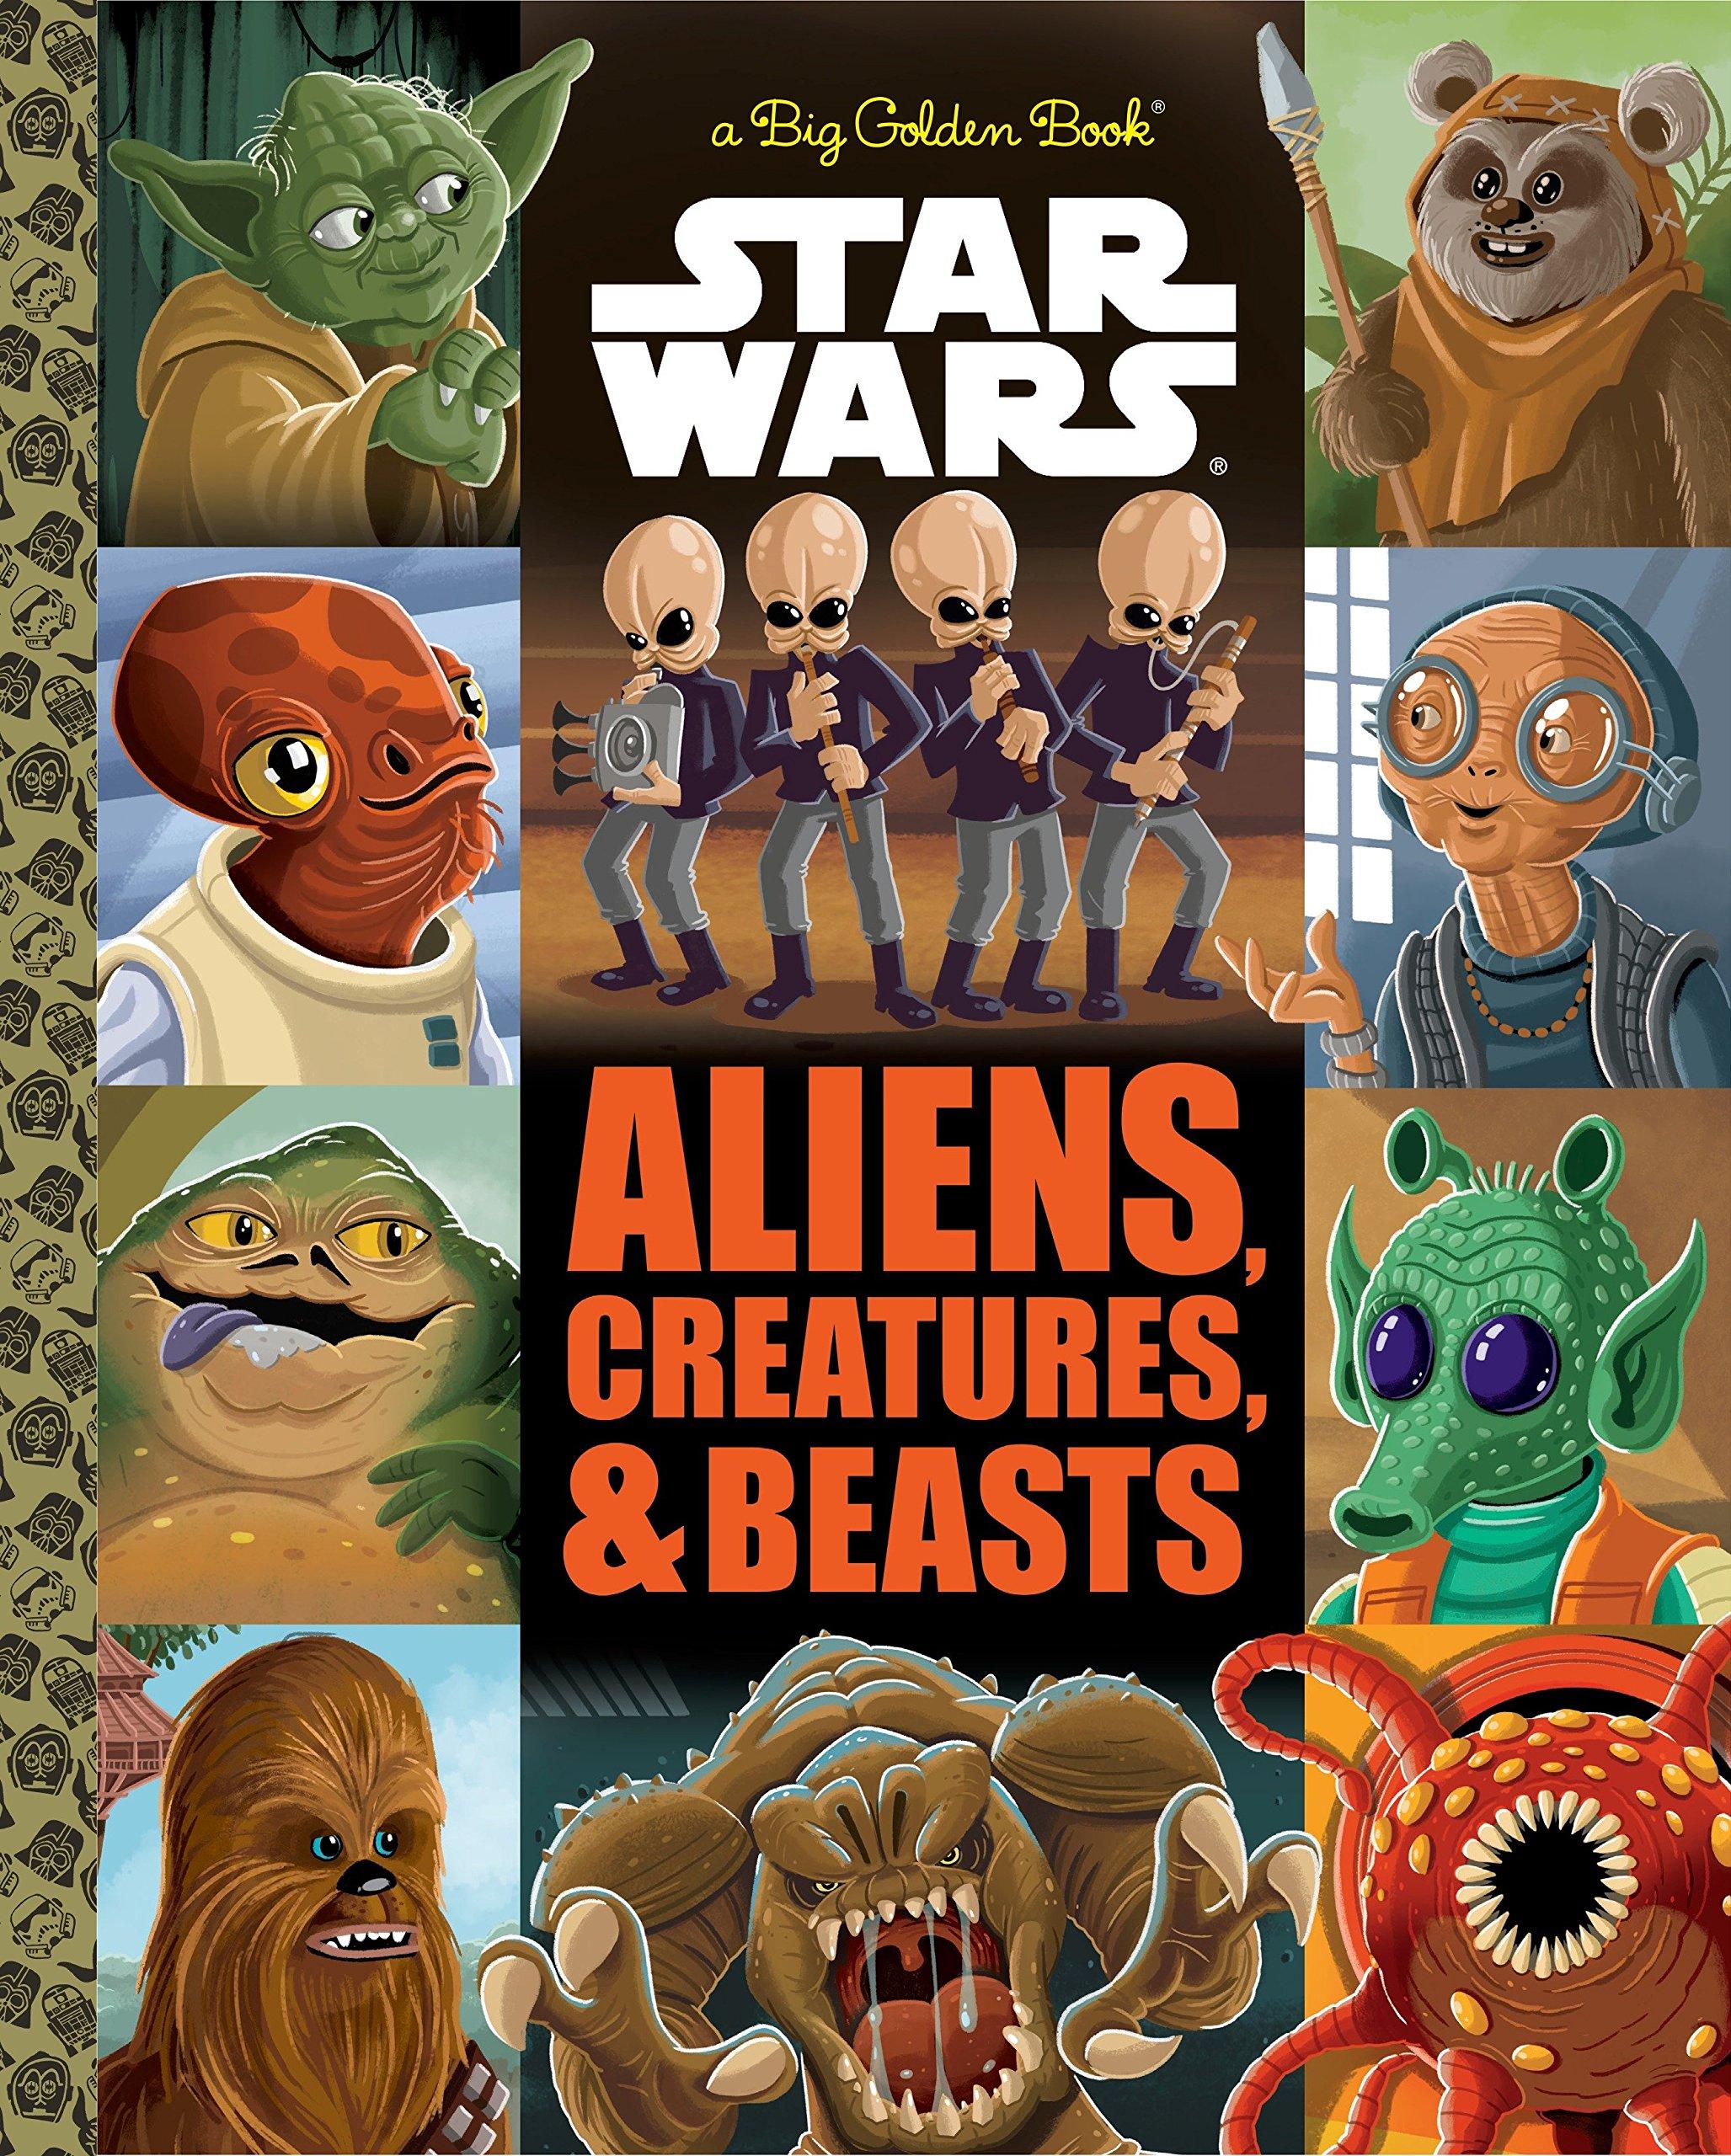 The Big Golden Book of Aliens, Creatures, and Beasts (Star Wars): Thomas  Macri, Chris Kennett: 9780736436915: Amazon.com: Books